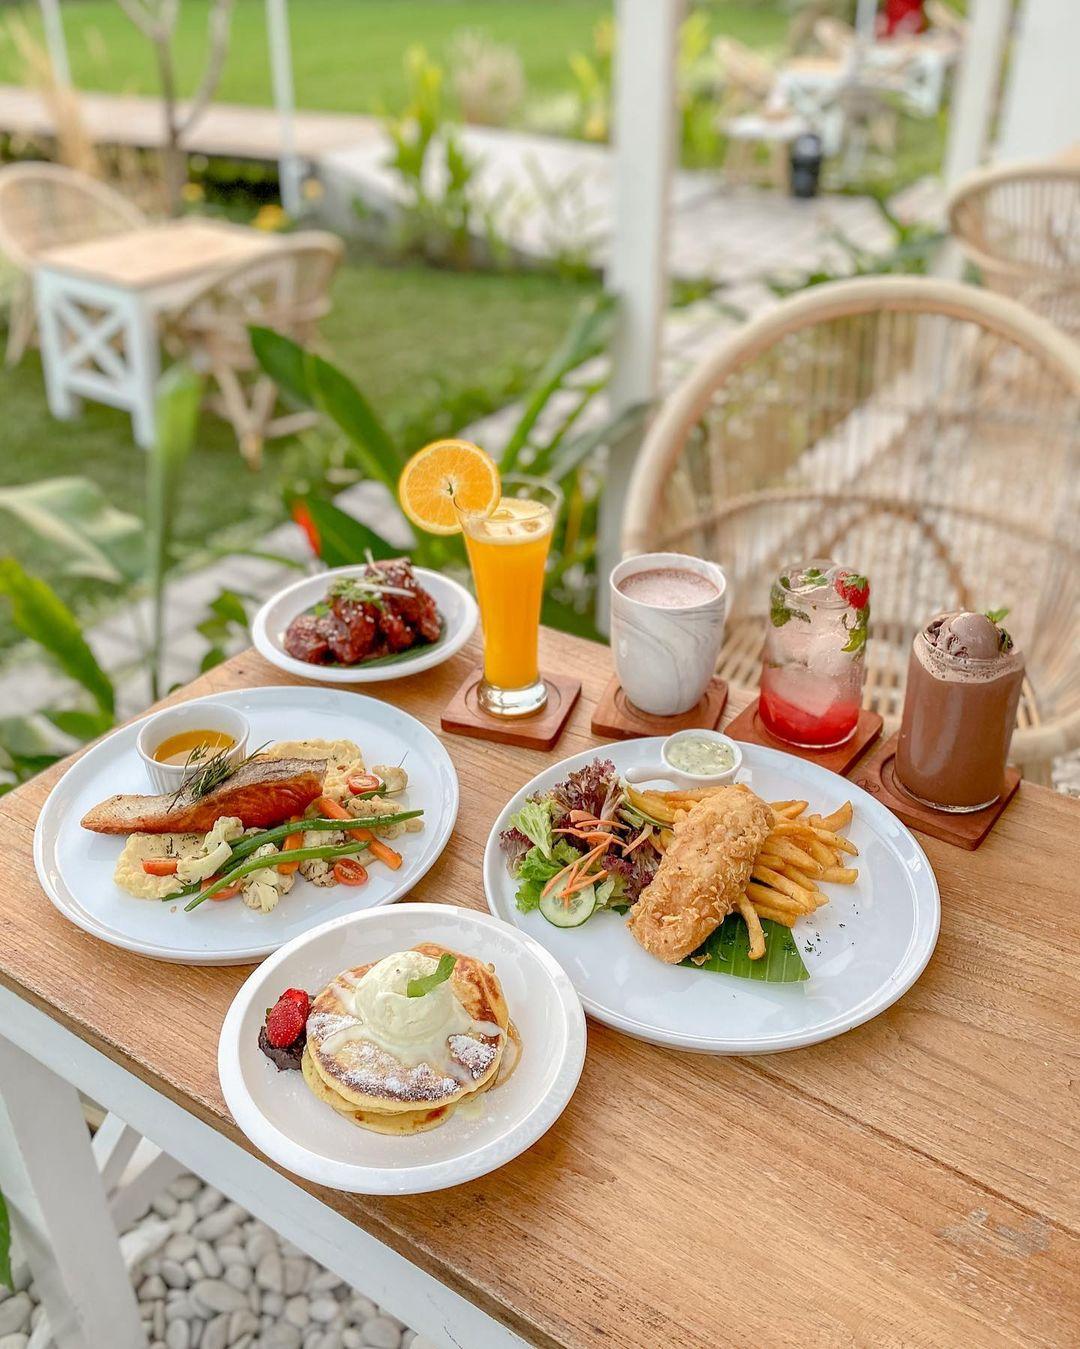 Makanan Di Padiku Eatery Coffee Image From @wonderfuljogja